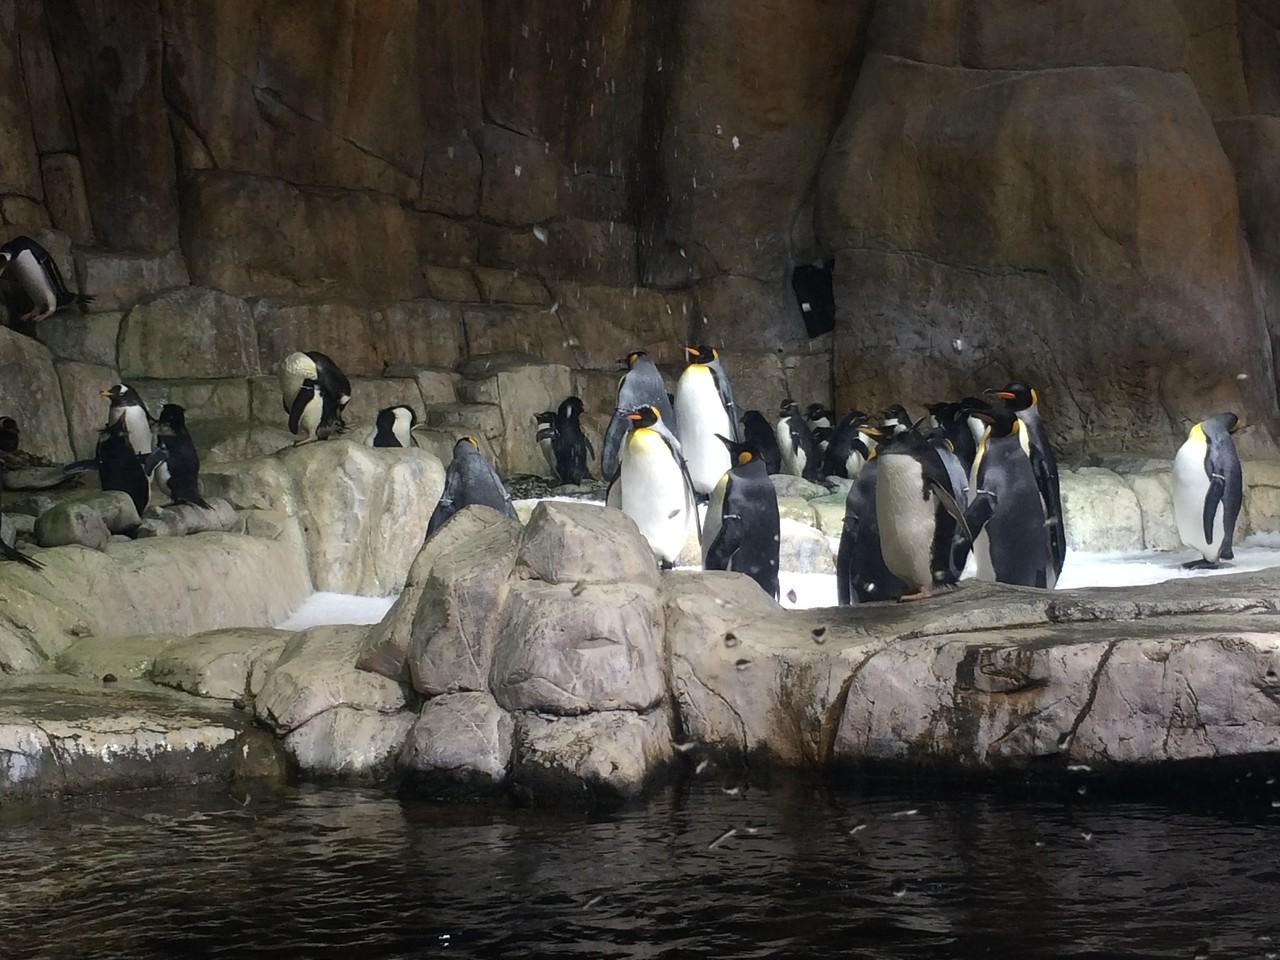 Henry Doorly Zoo - Omaha